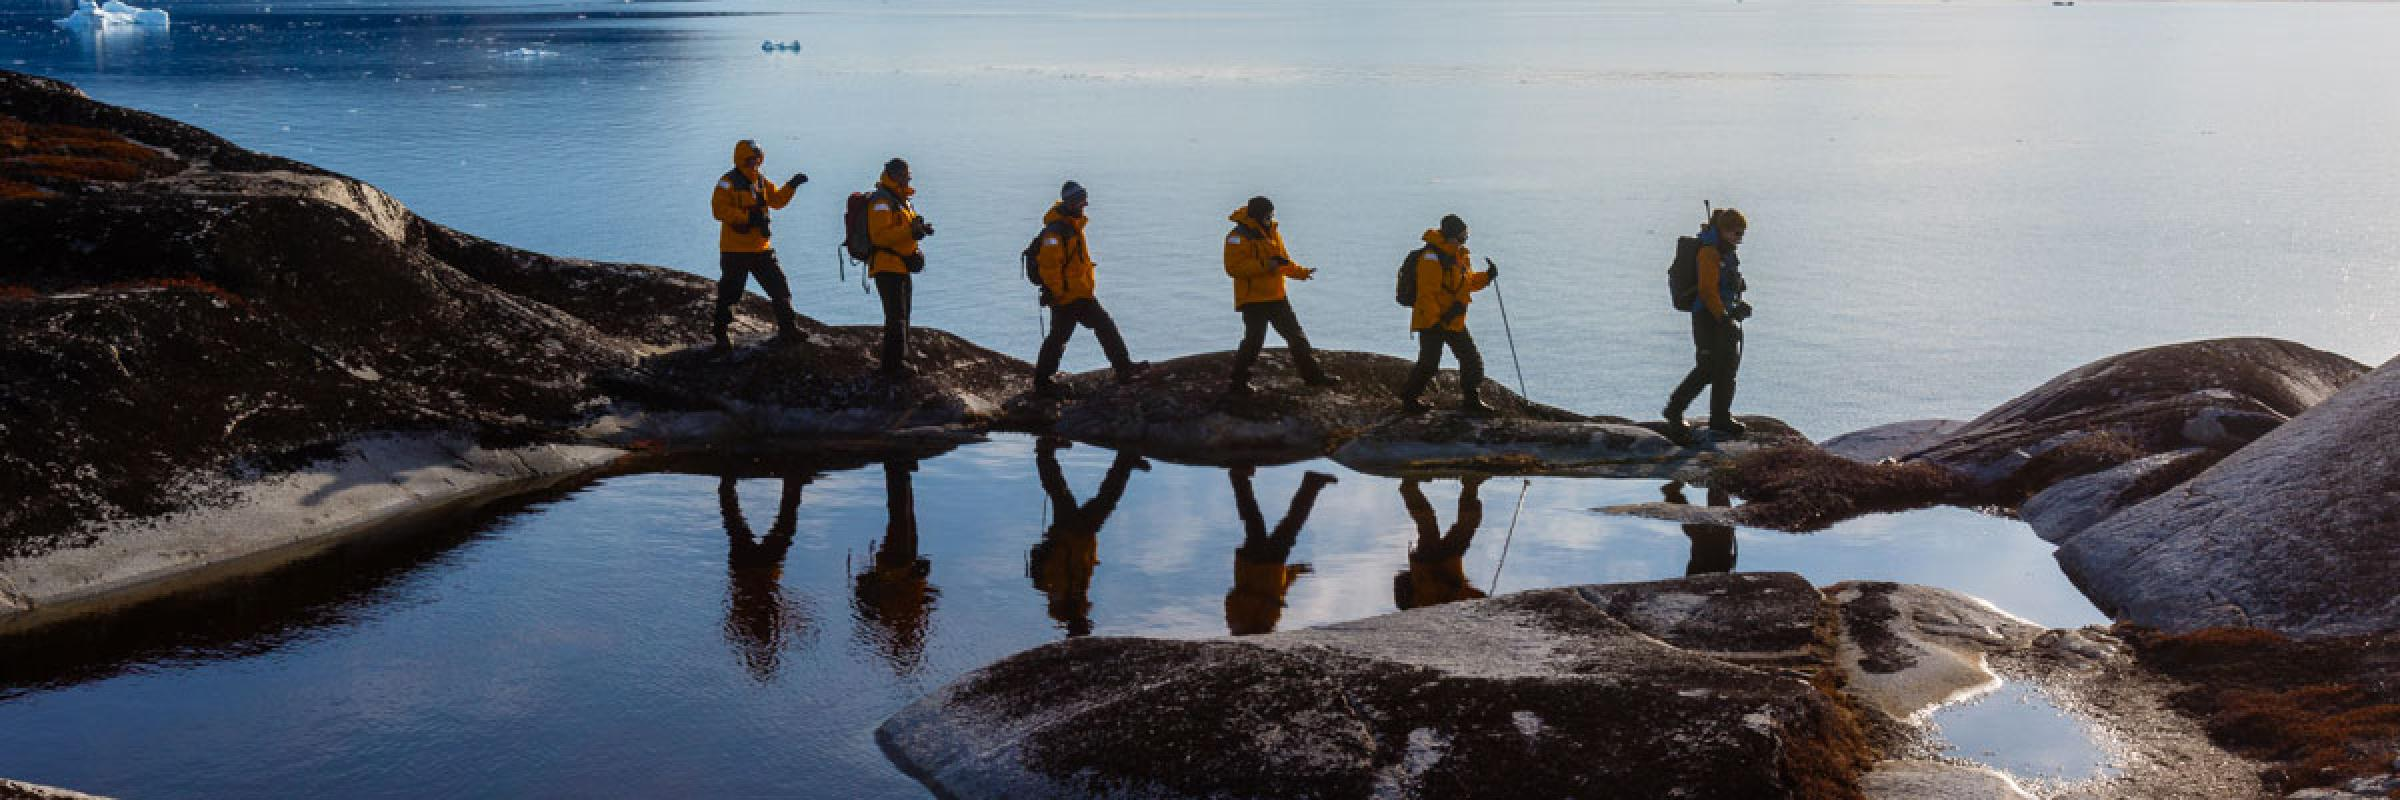 six hikers trekking in svalbard arctic archipelagos